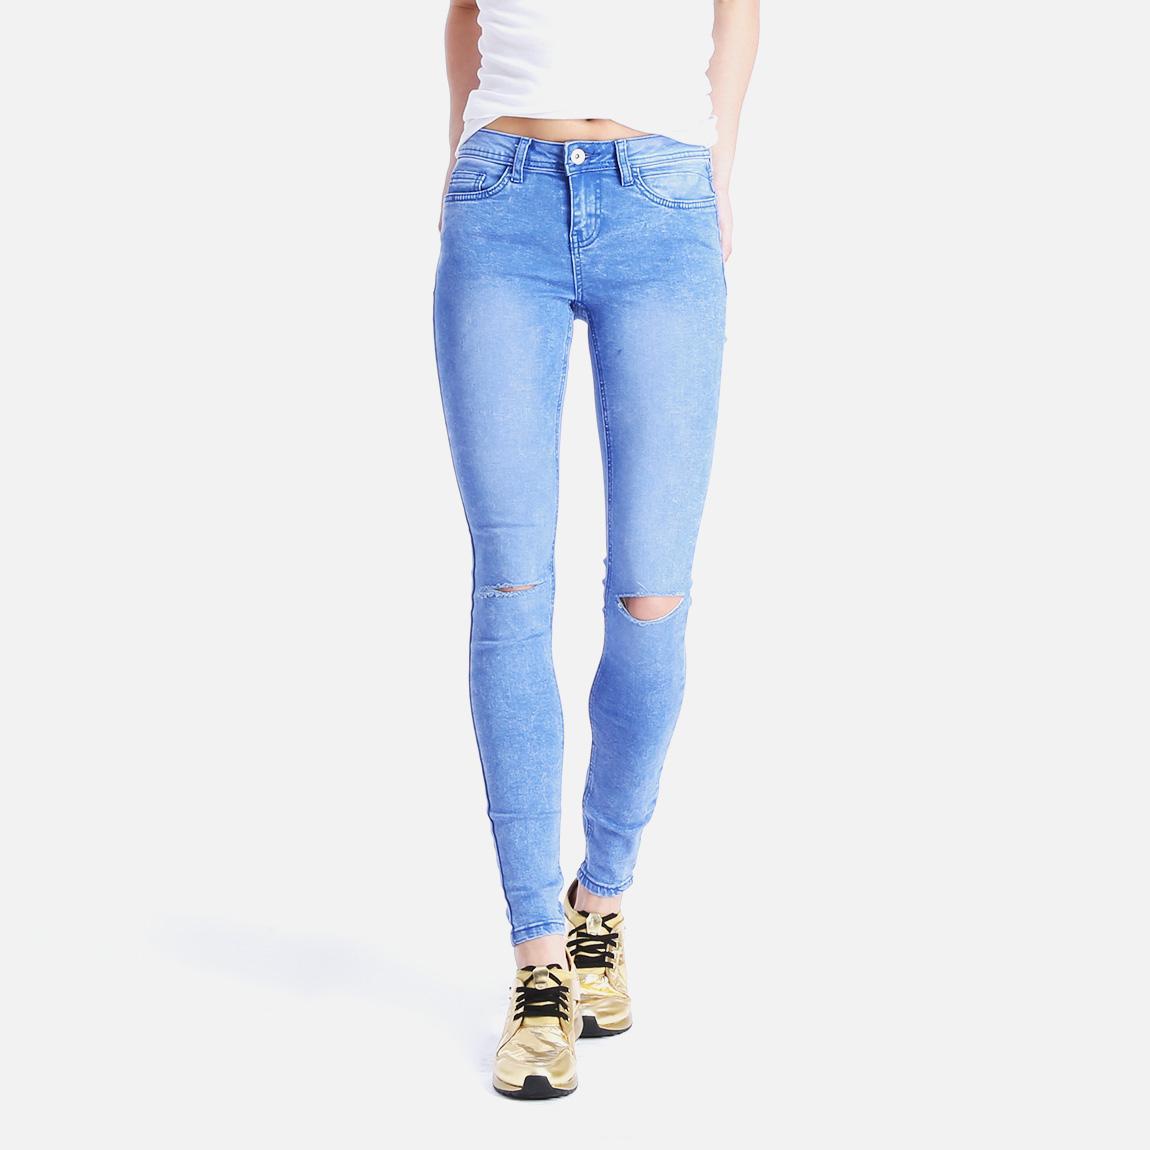 knee slash betty blue new look jeans. Black Bedroom Furniture Sets. Home Design Ideas